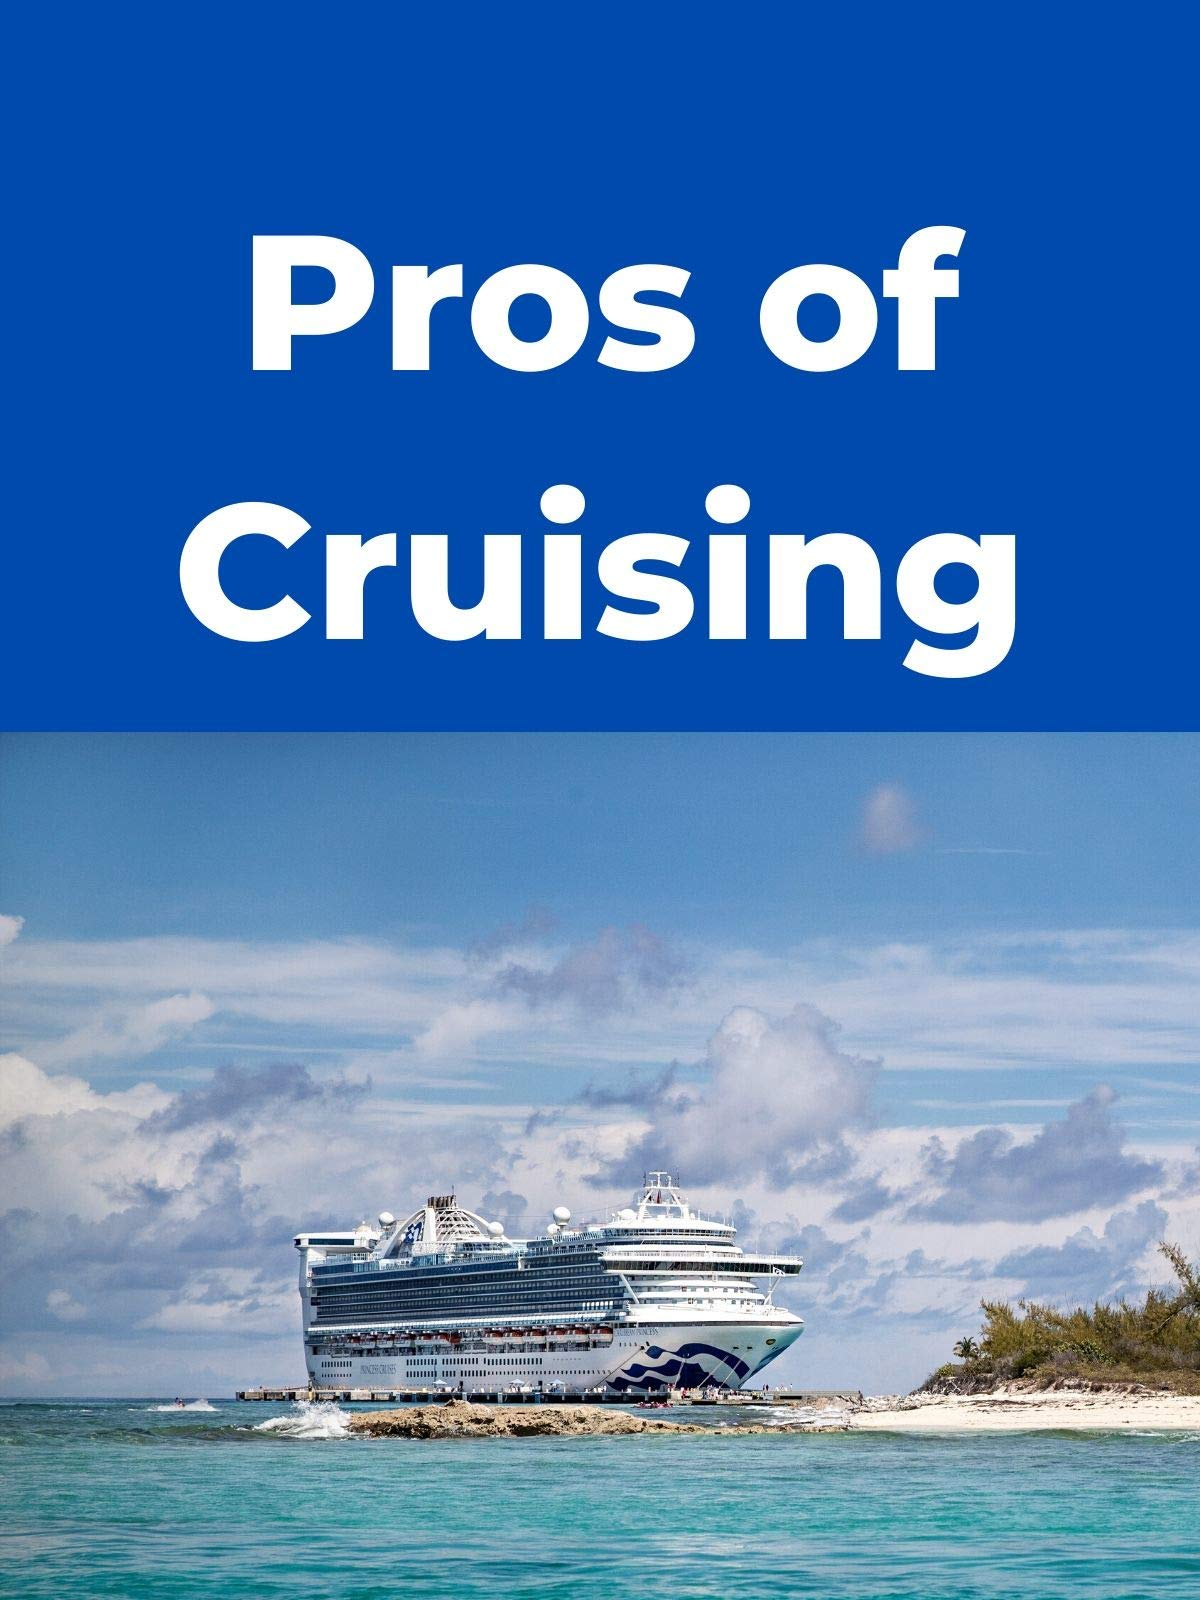 Clip: The Pros of Cruising